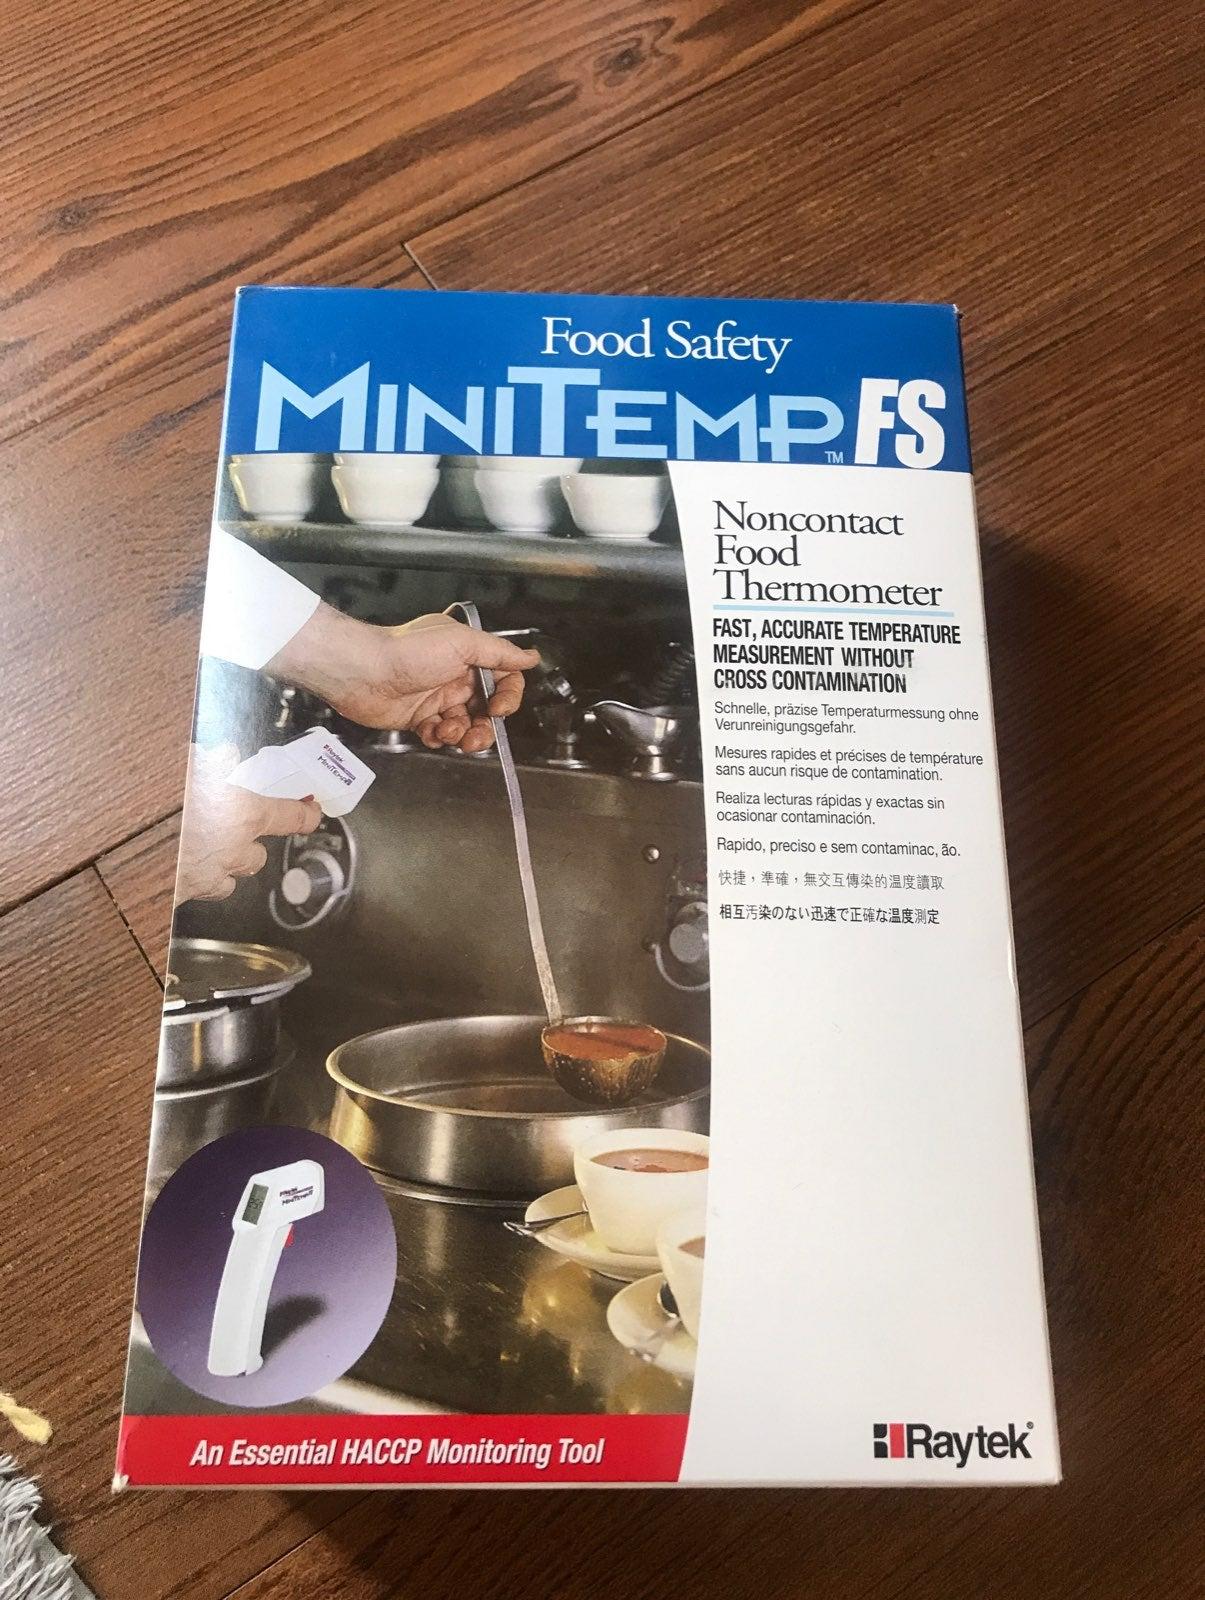 Raytek minitemp FS non contact thermomet